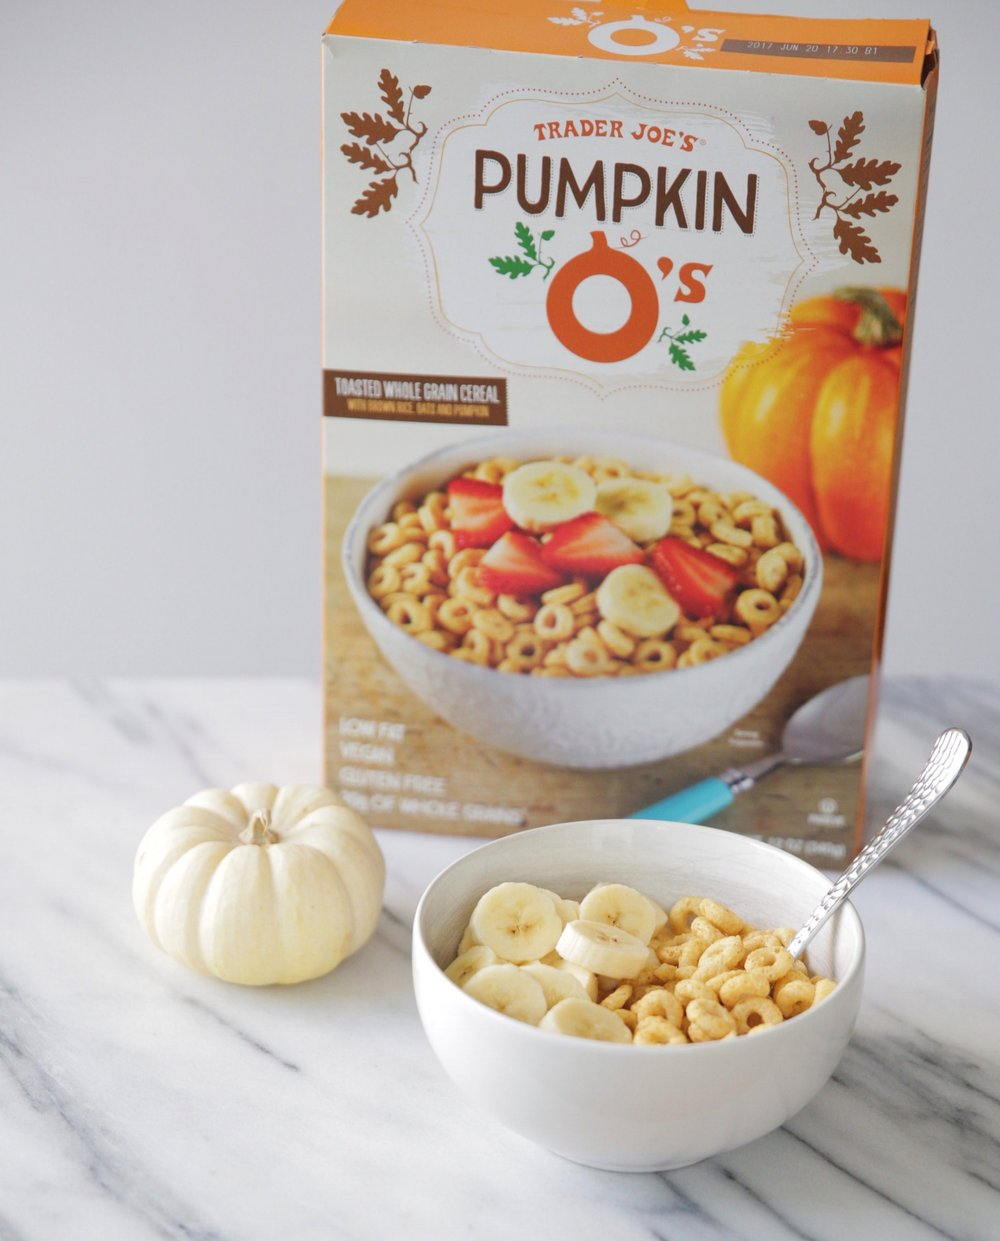 Trader-Joe's-Pumpkin-Os-Vegan-Gluten-Free-LaurenSchwaiger-Healthy-Living-Blog.jpg